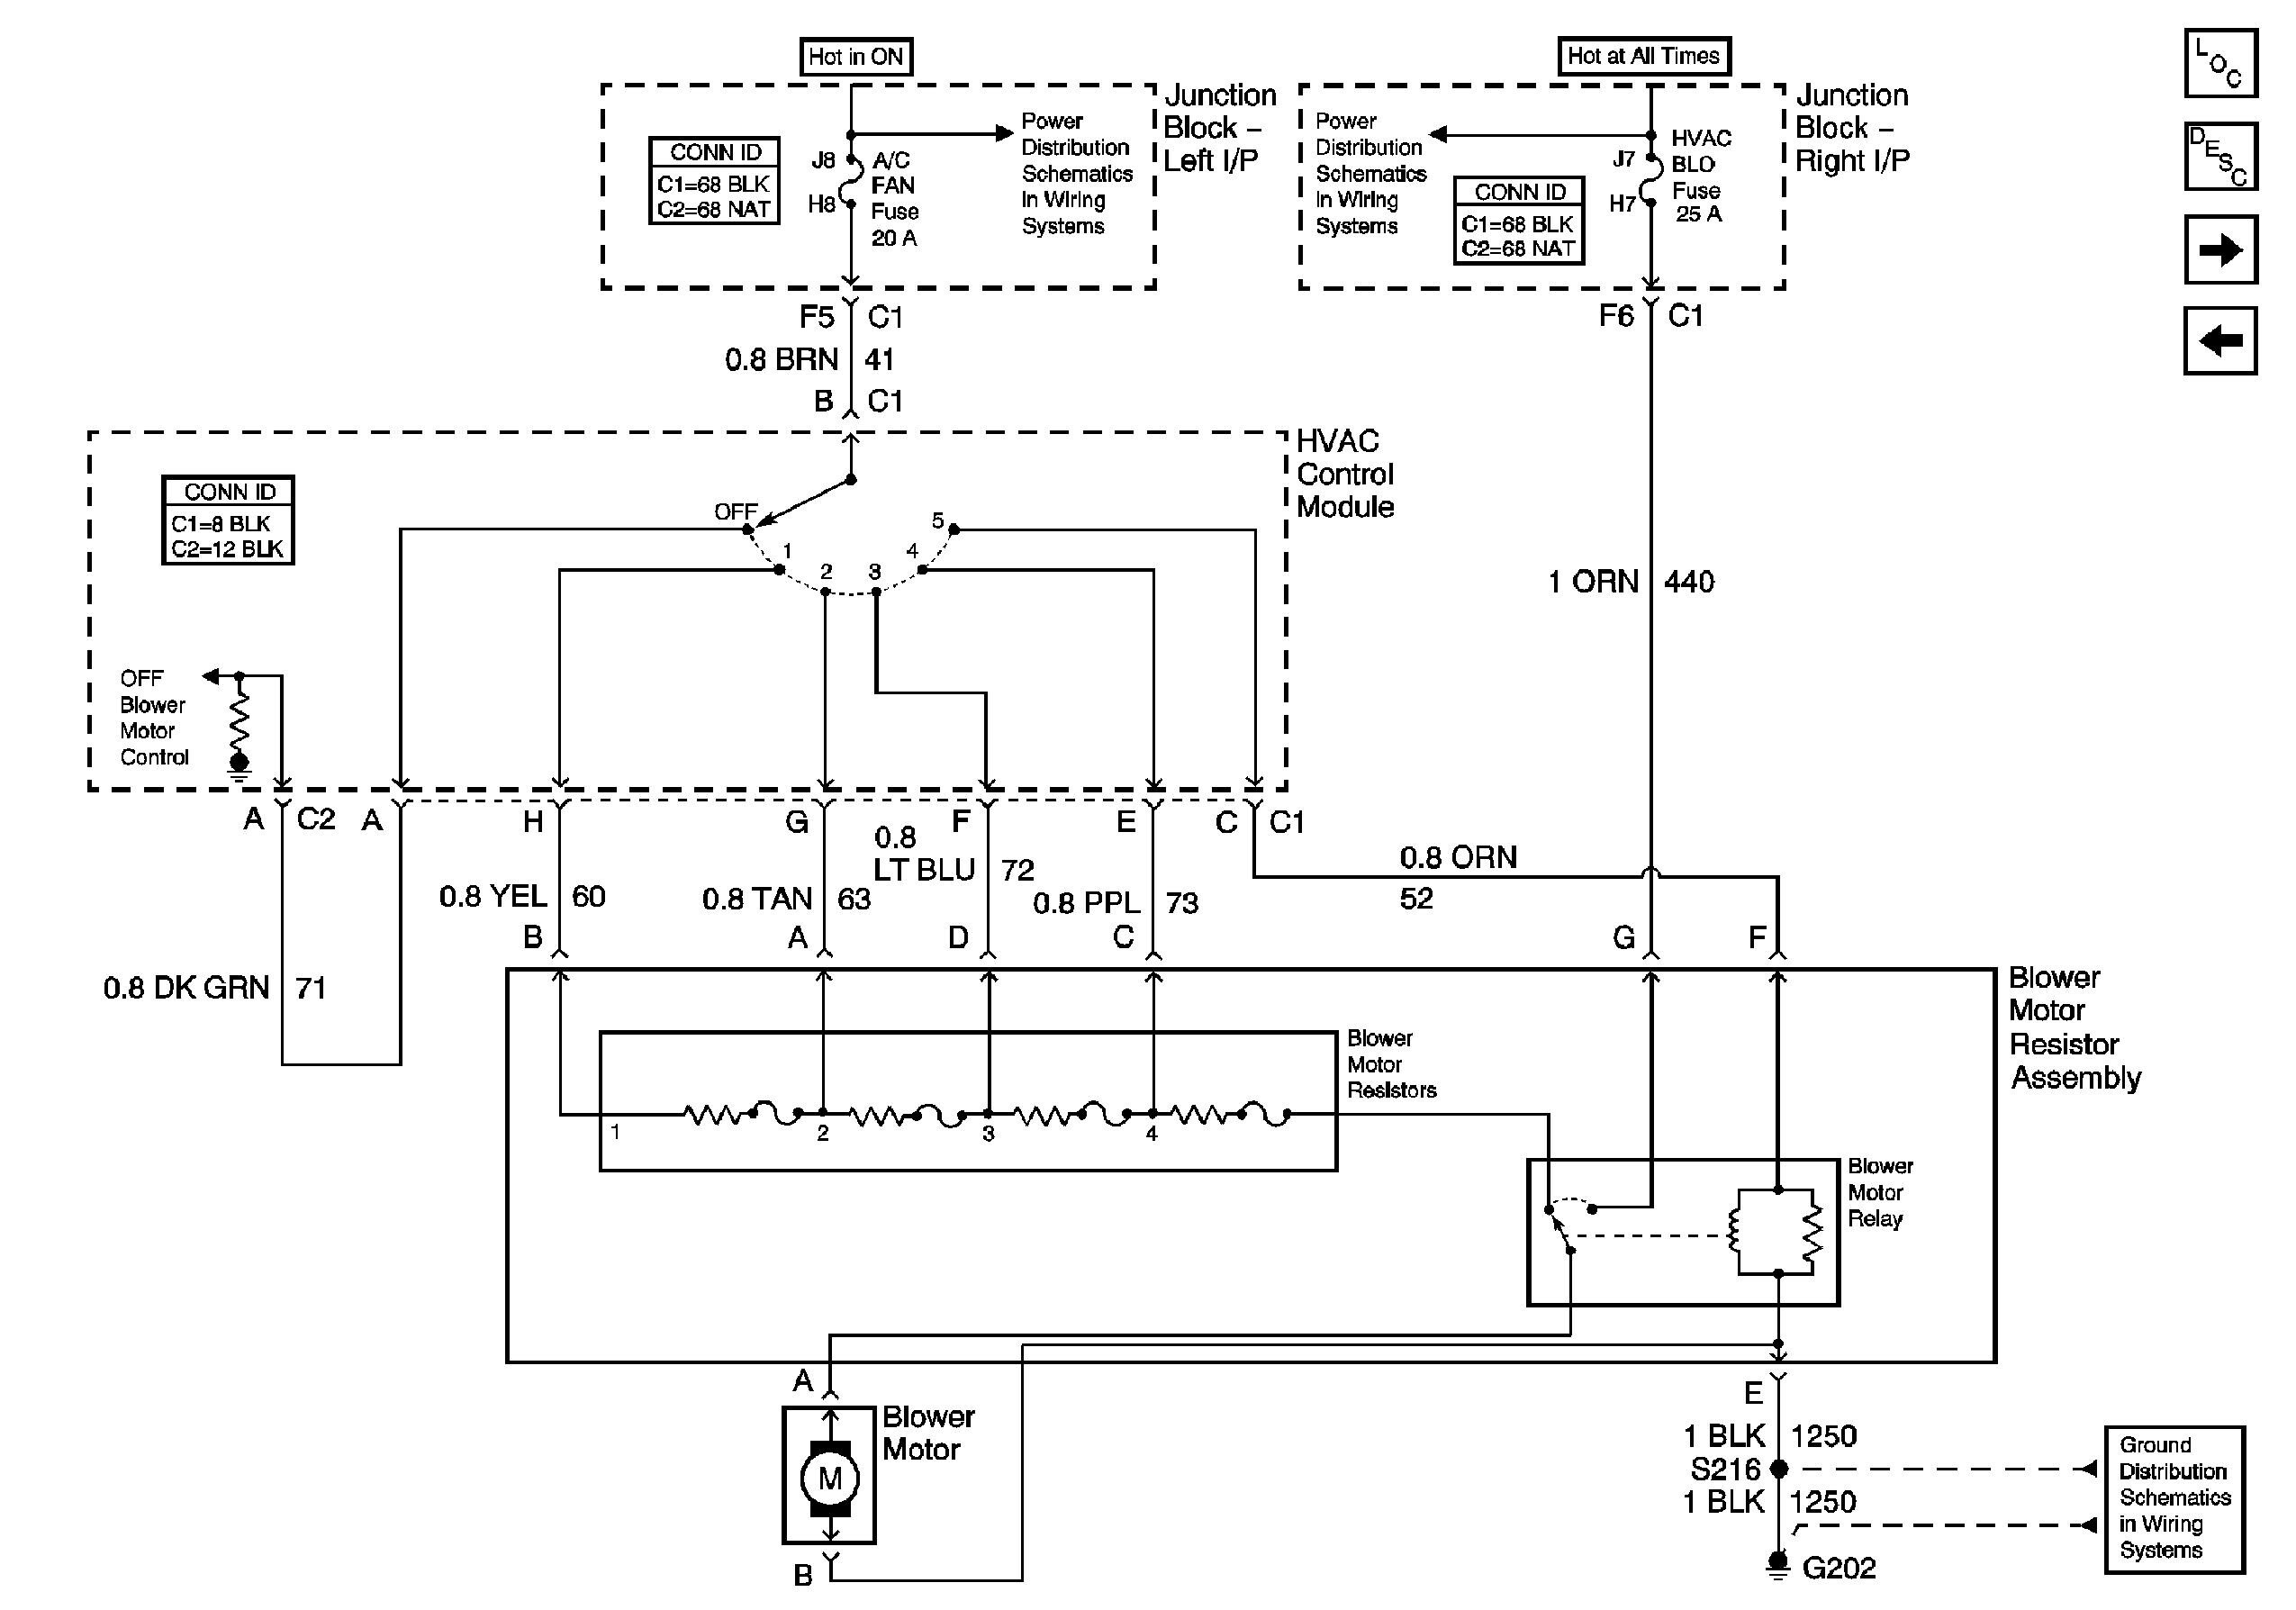 2006 Chevy Silverado Blower Motor Resistor Wiring Diagram Wiring Diagrams Wet Metal Wet Metal Alcuoredeldiabete It